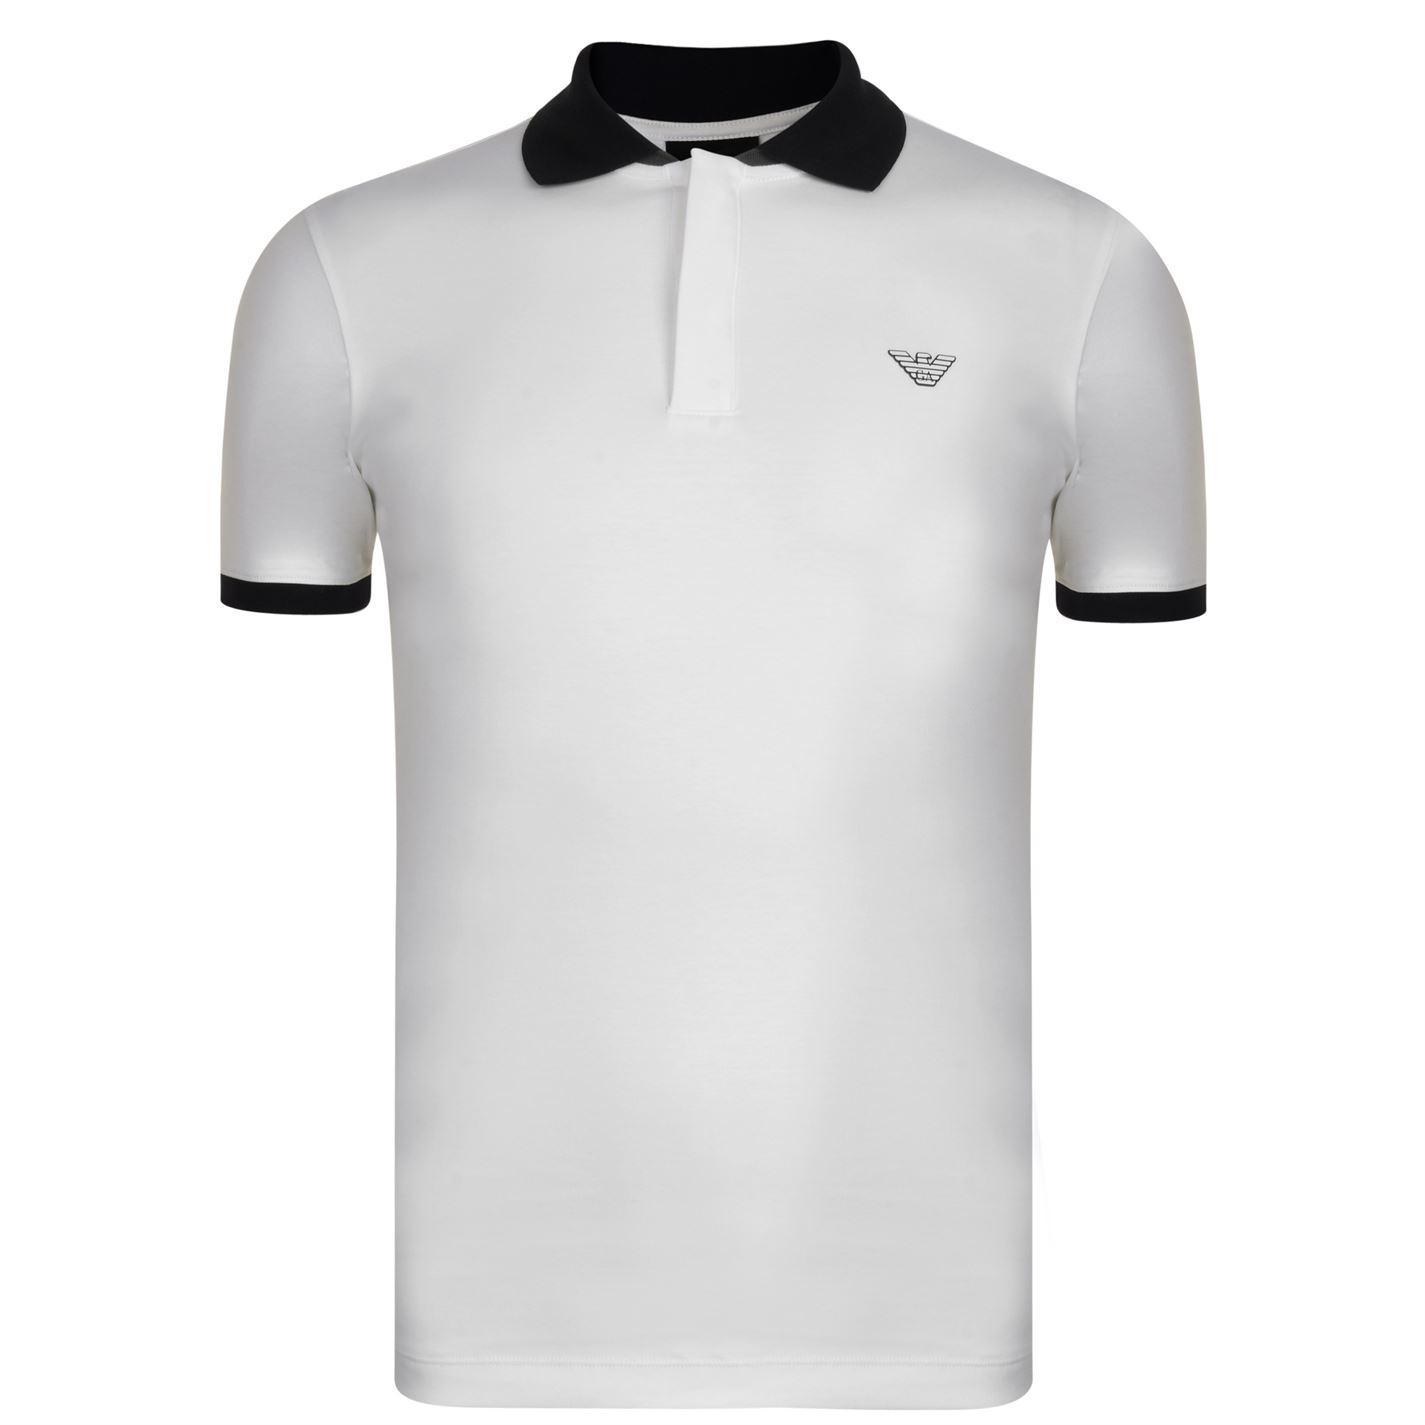 e36a398b Lyst - Emporio Armani Rubber Logo Polo Shirt in White for Men